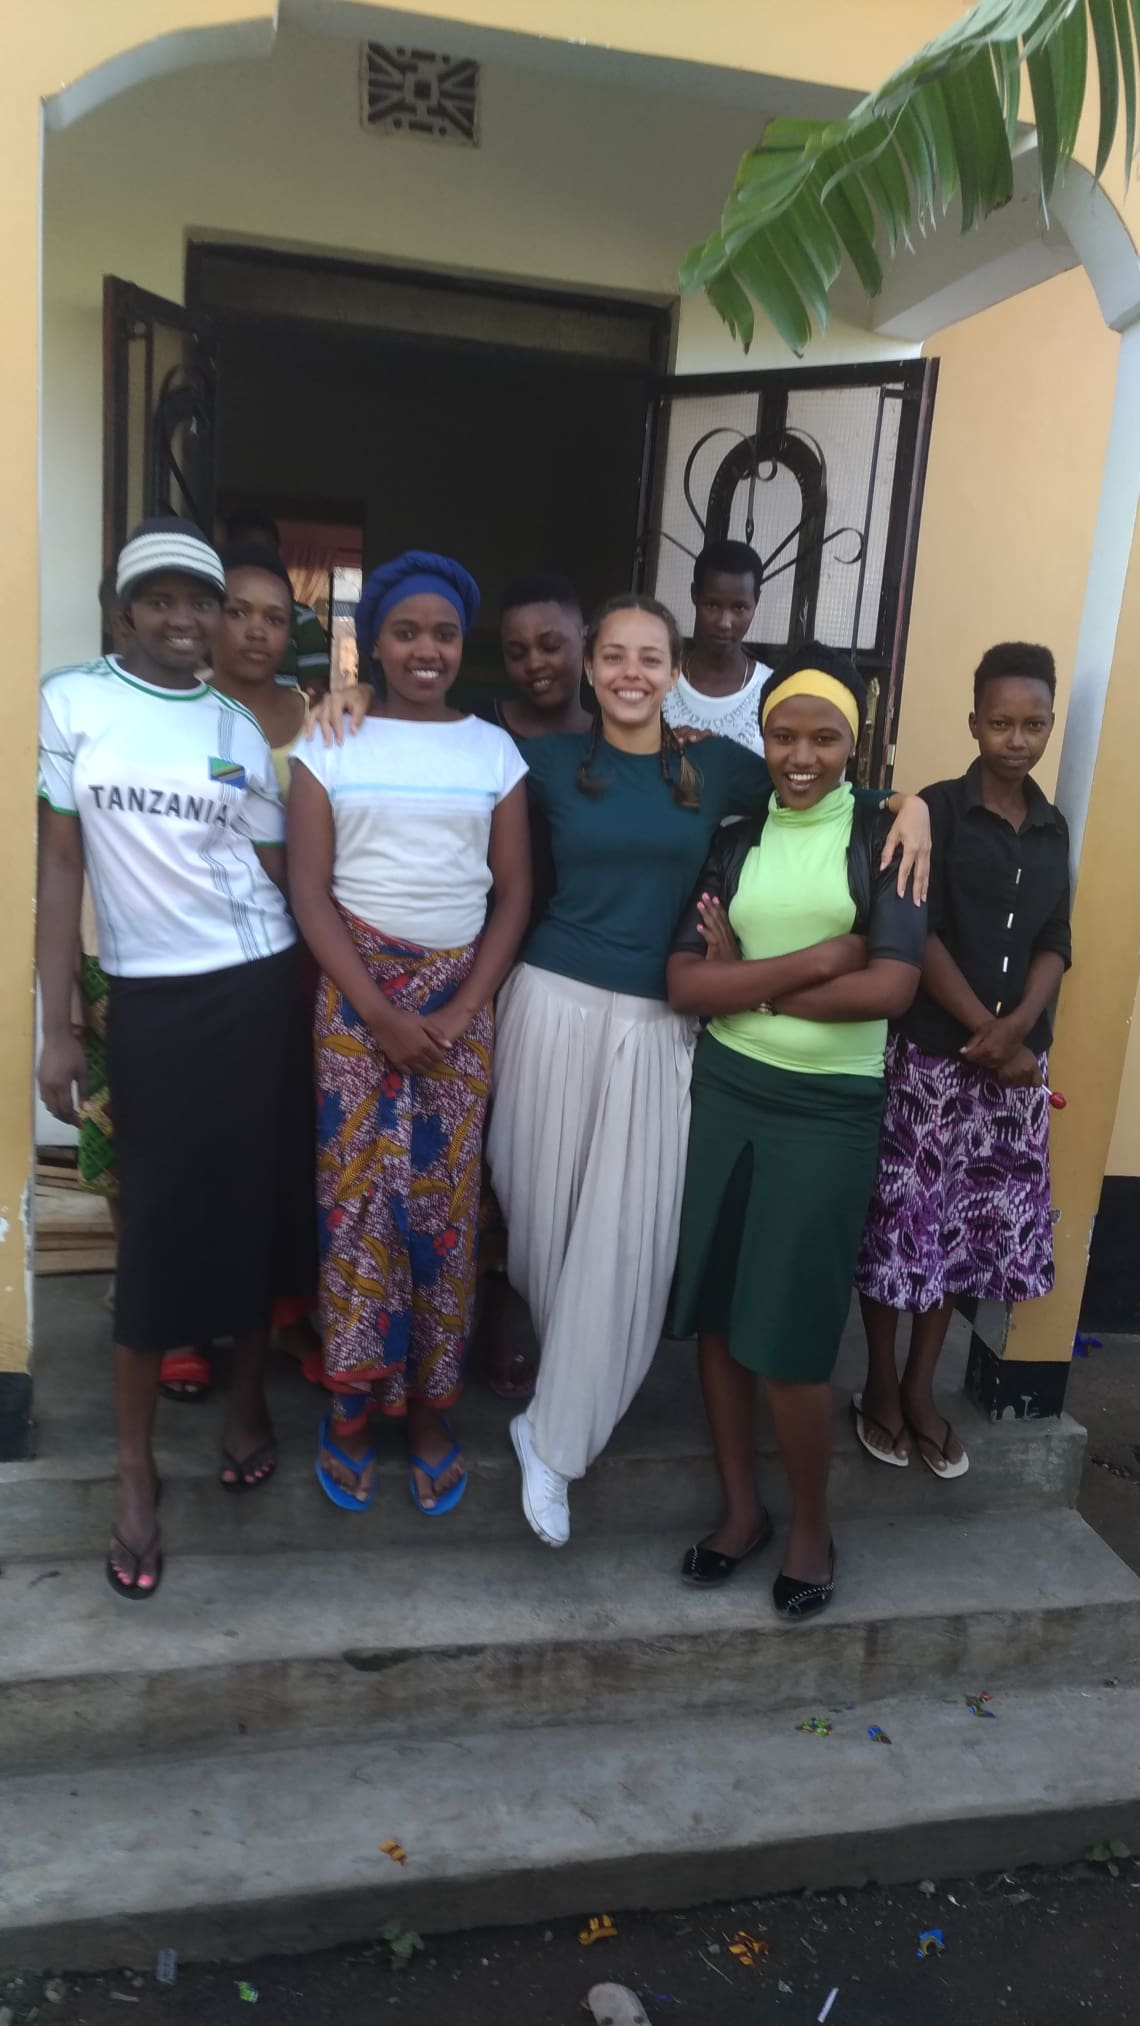 voluntaria em projeto social africano